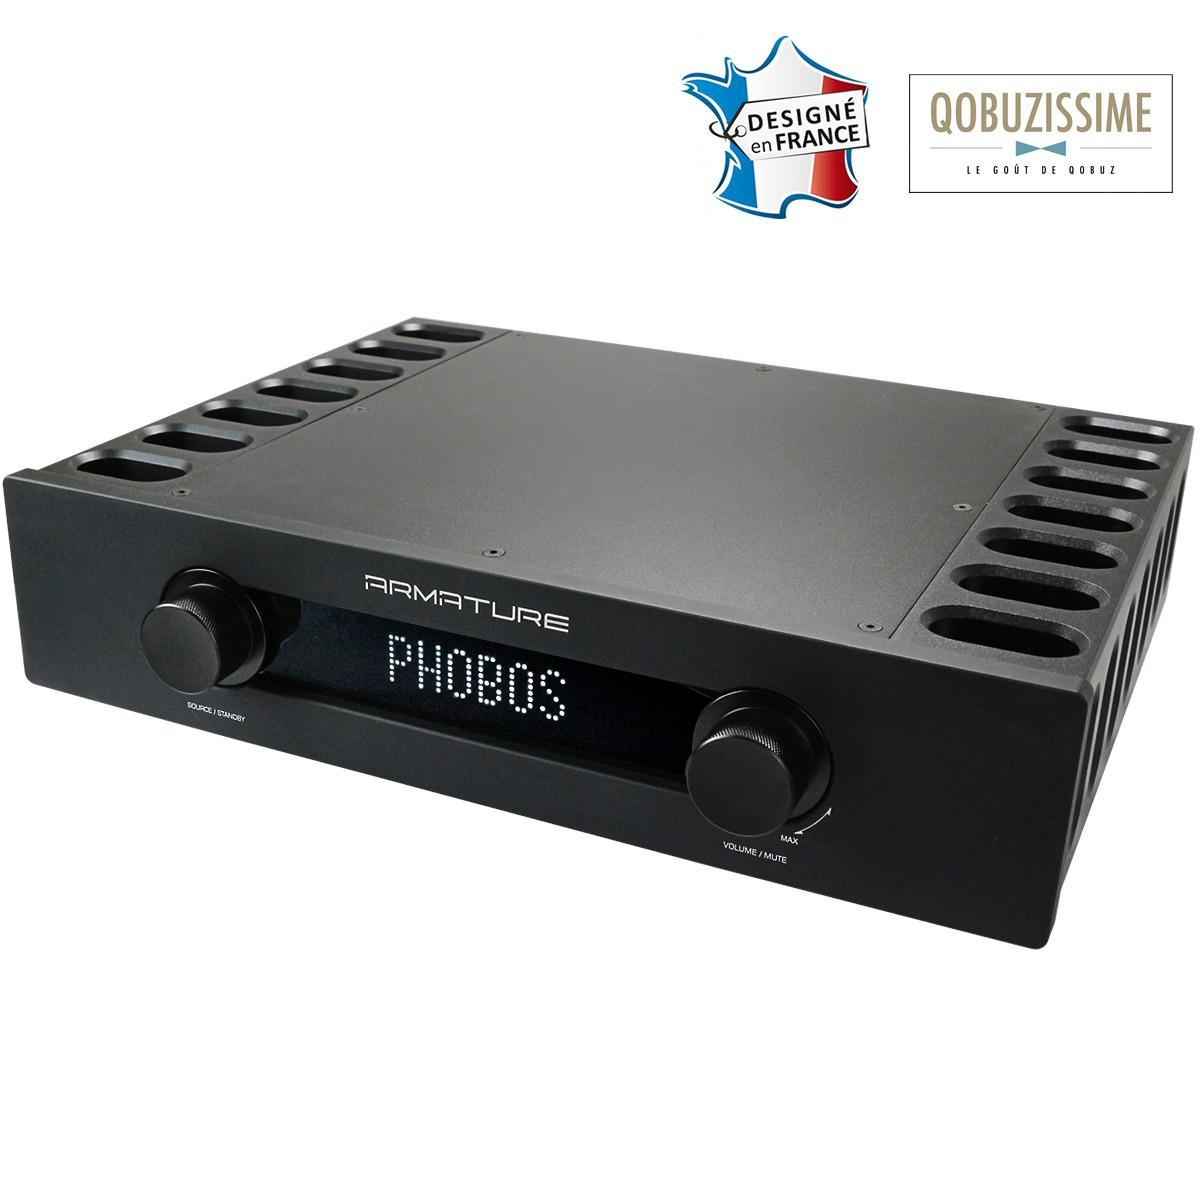 ARMATURE PHOBOS AB Amplifier USB DAC 24bit/192khz